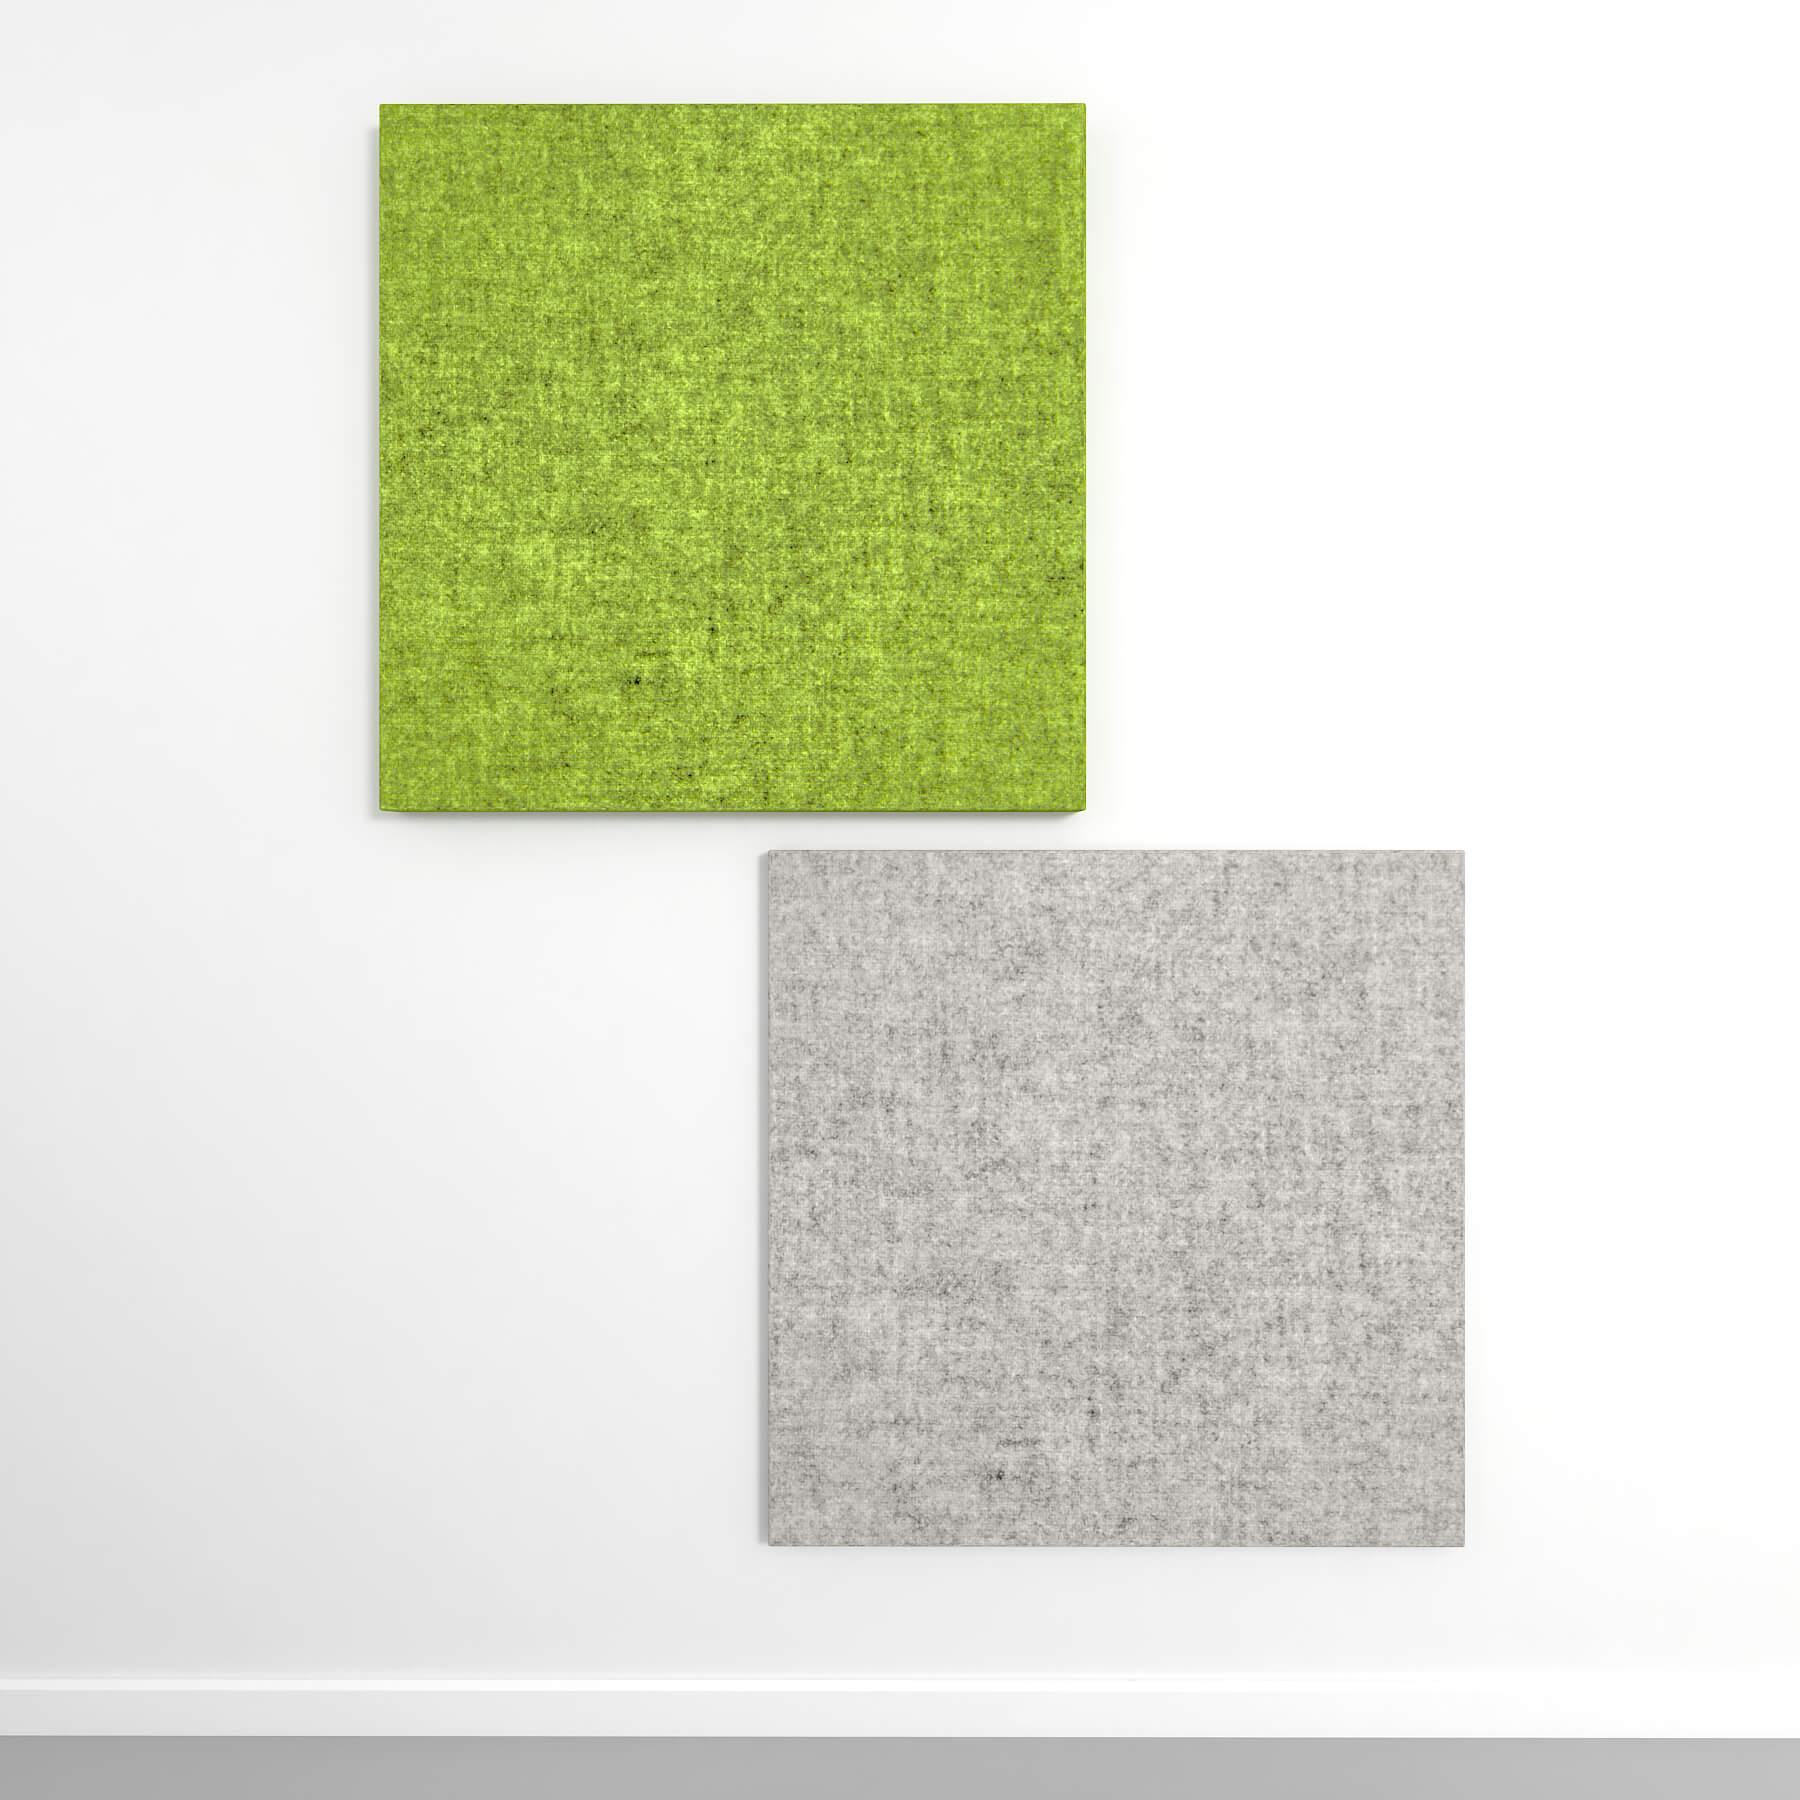 Akustik Wandverkleidung MODUS 1.200 x 1.200 mm Akustikplatten Wandpaneele Filz